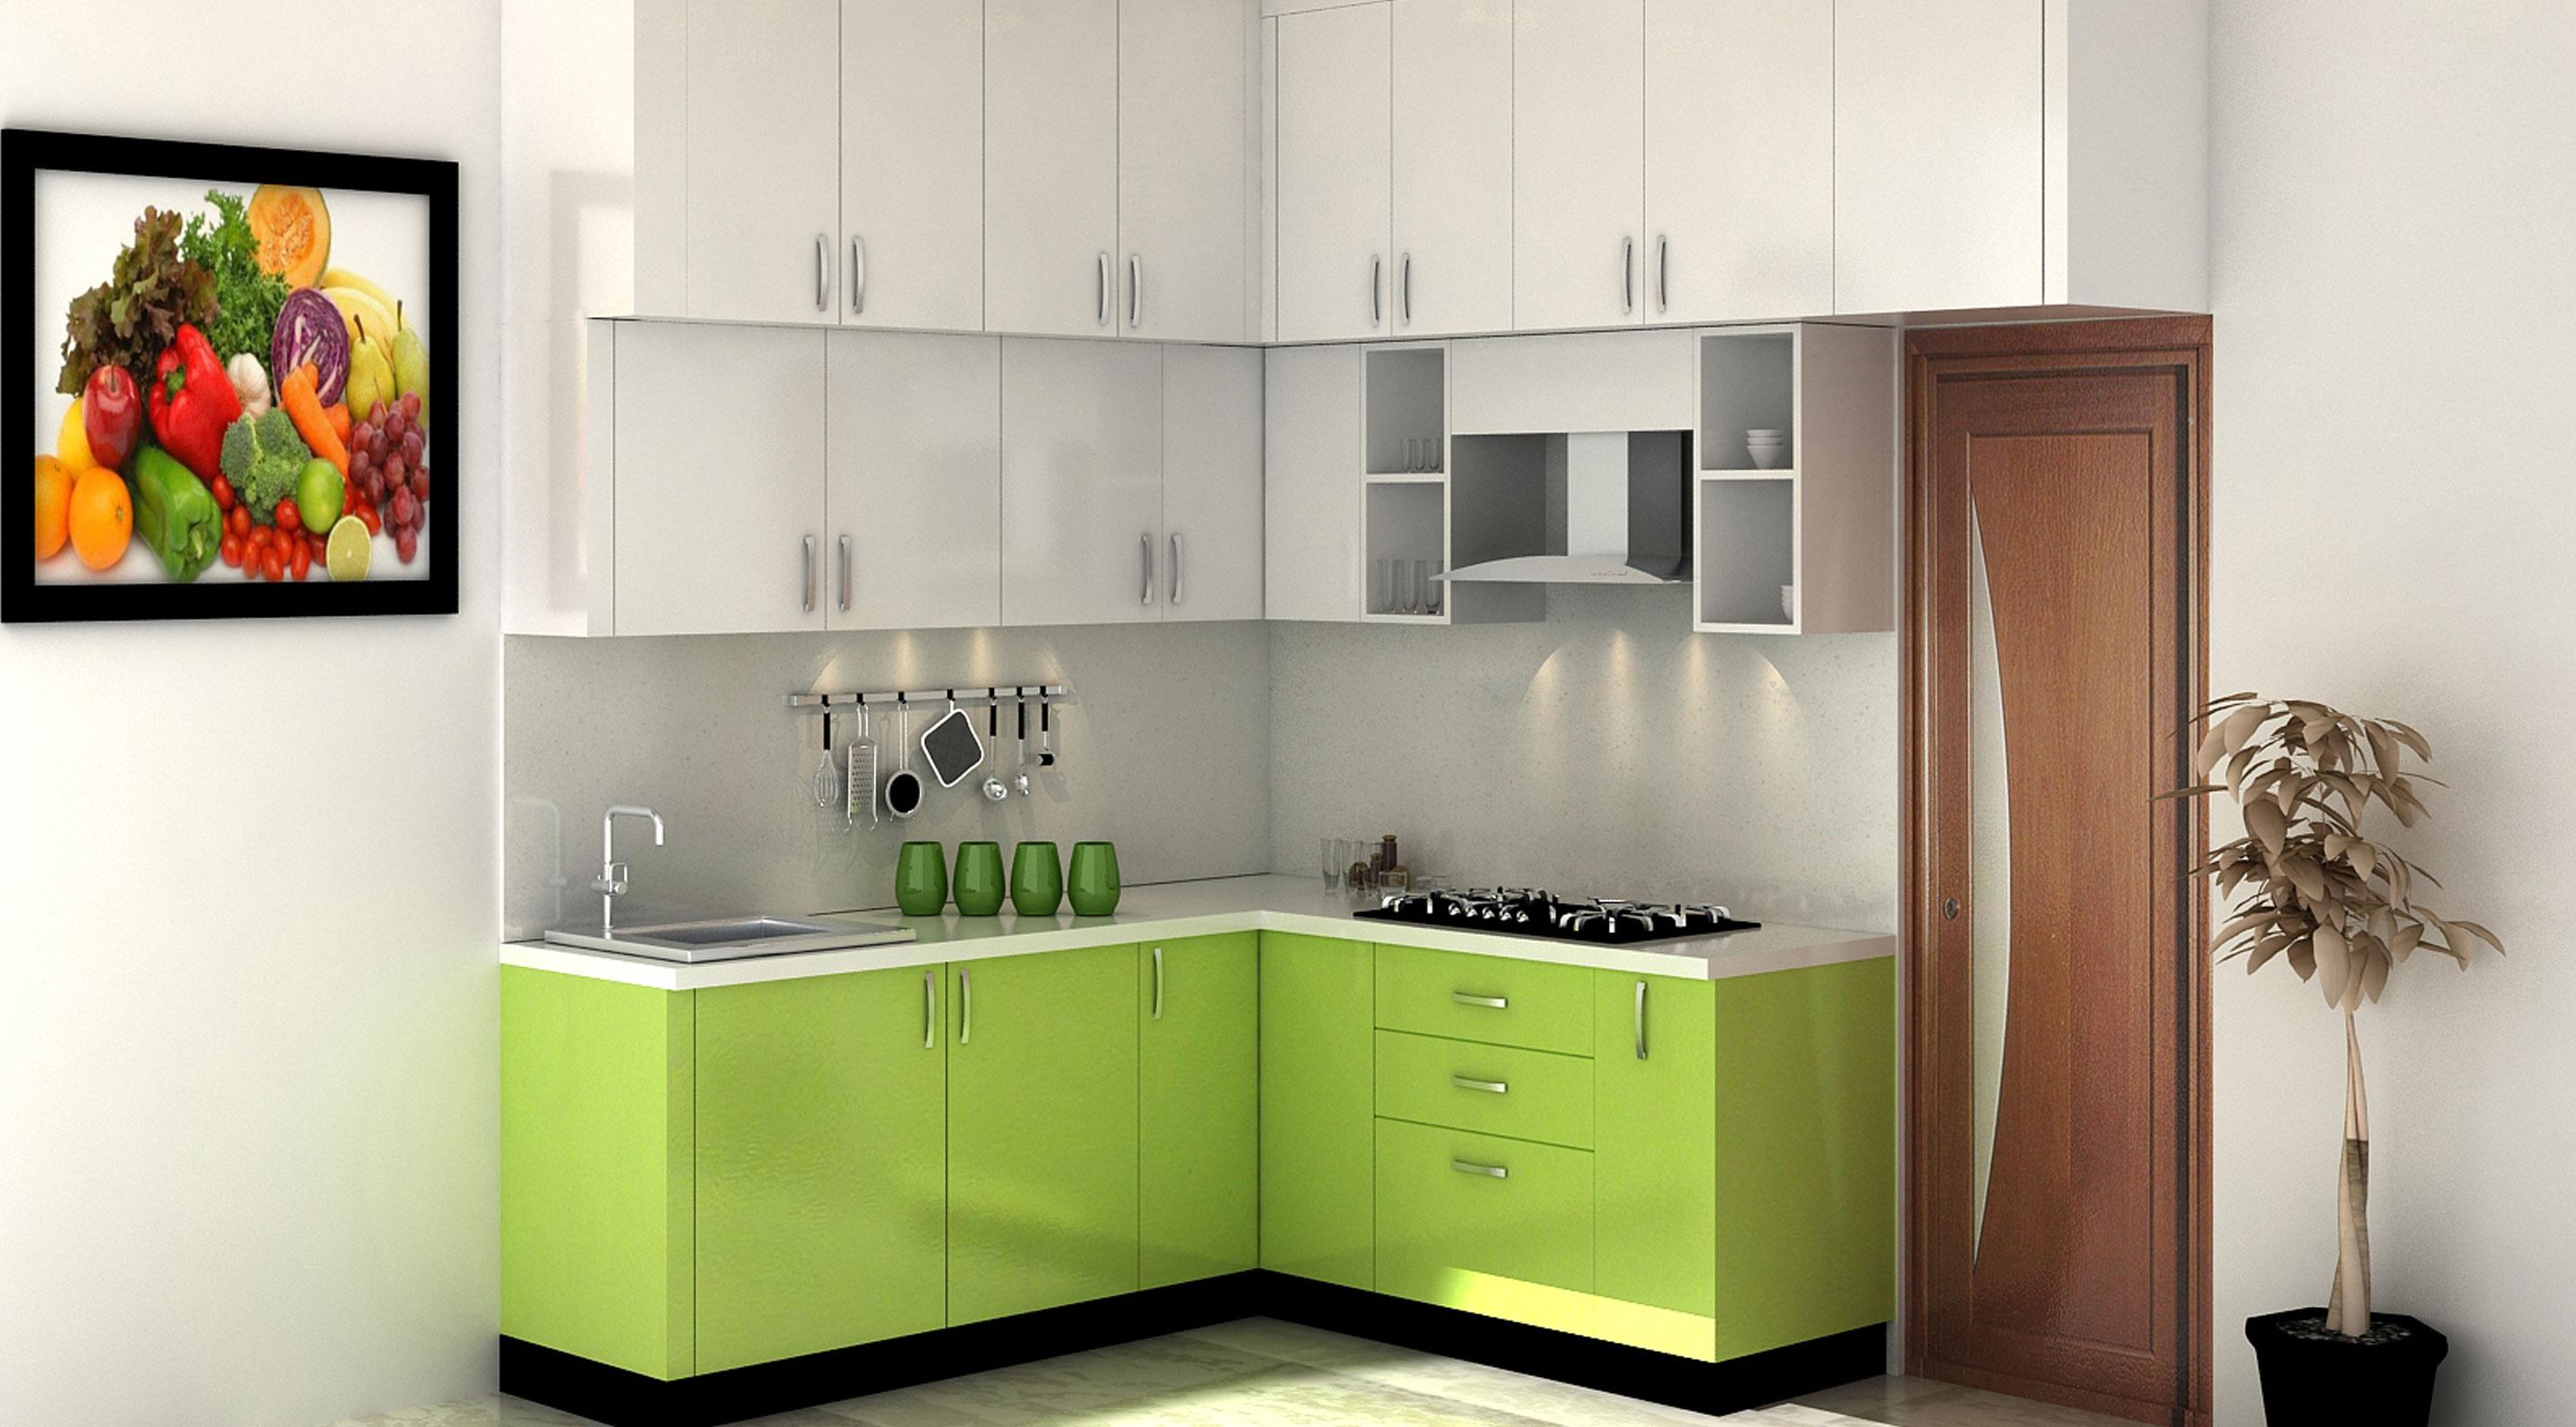 Best Modular Kitchen Bangalore 1. Lifelong Modular Furniture Bangalore Image 1